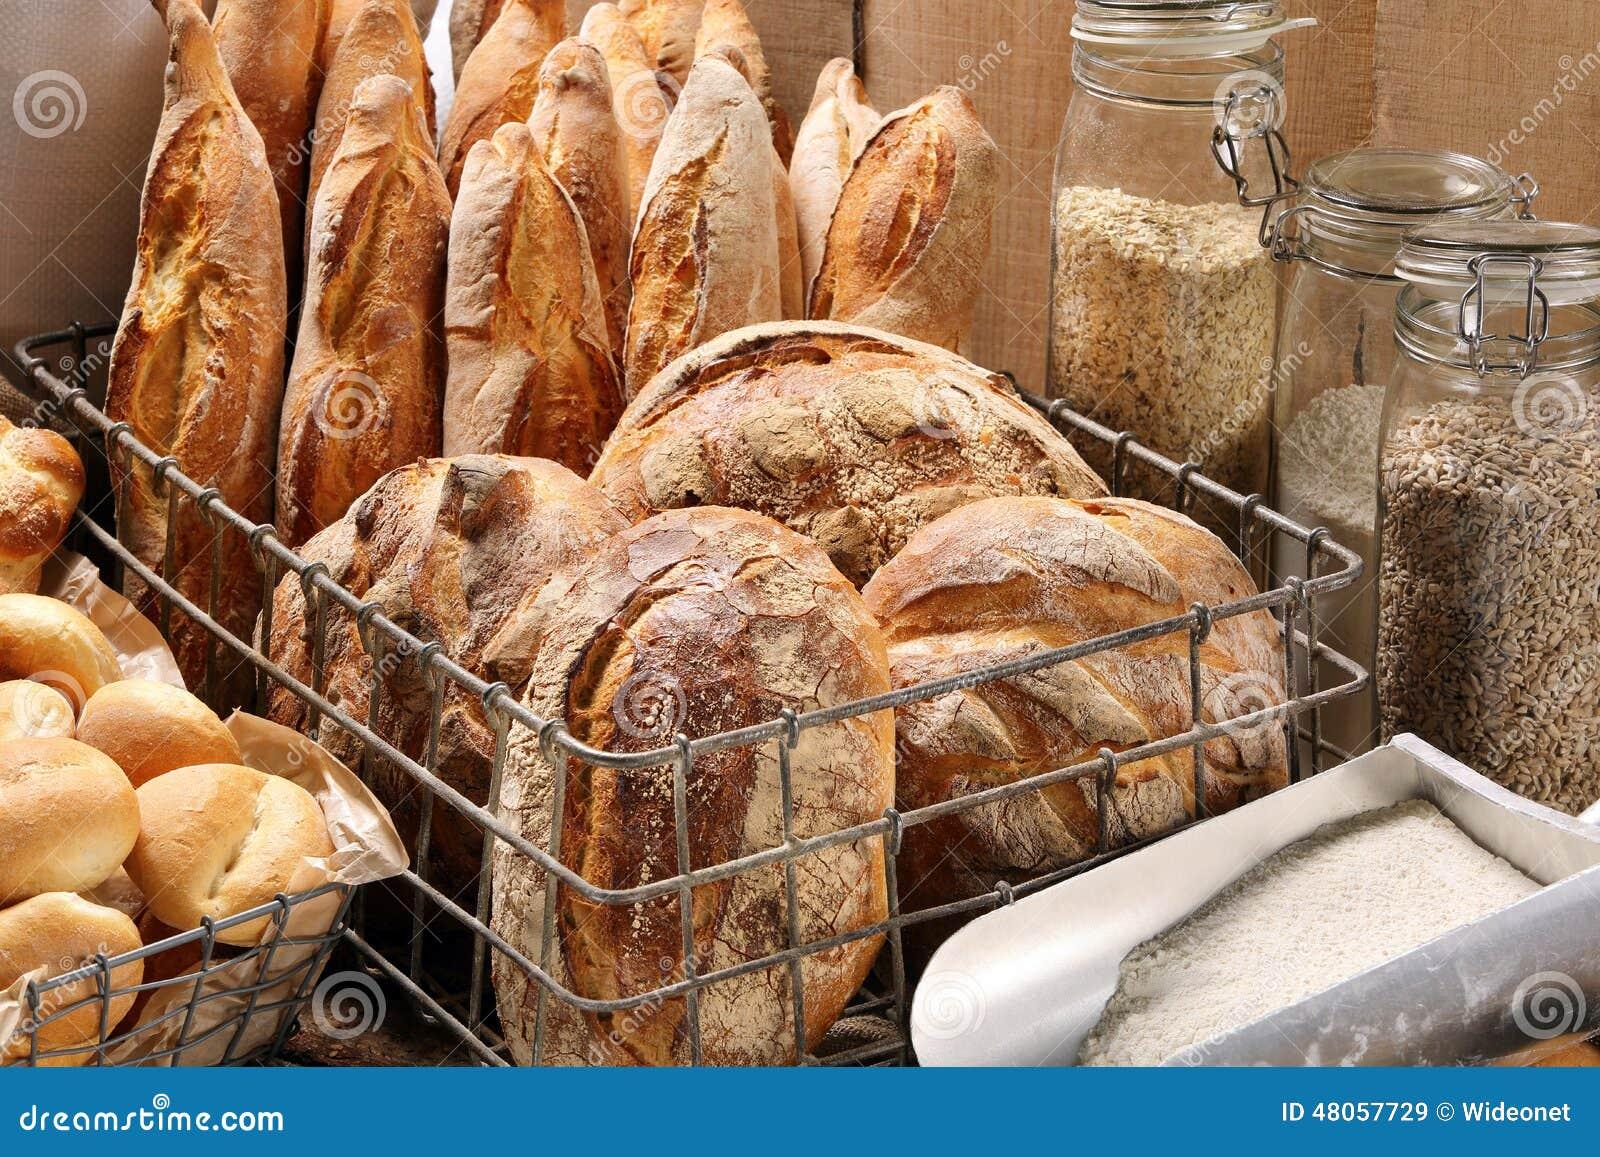 Fresh bread in metal basket in bakery on wooden background